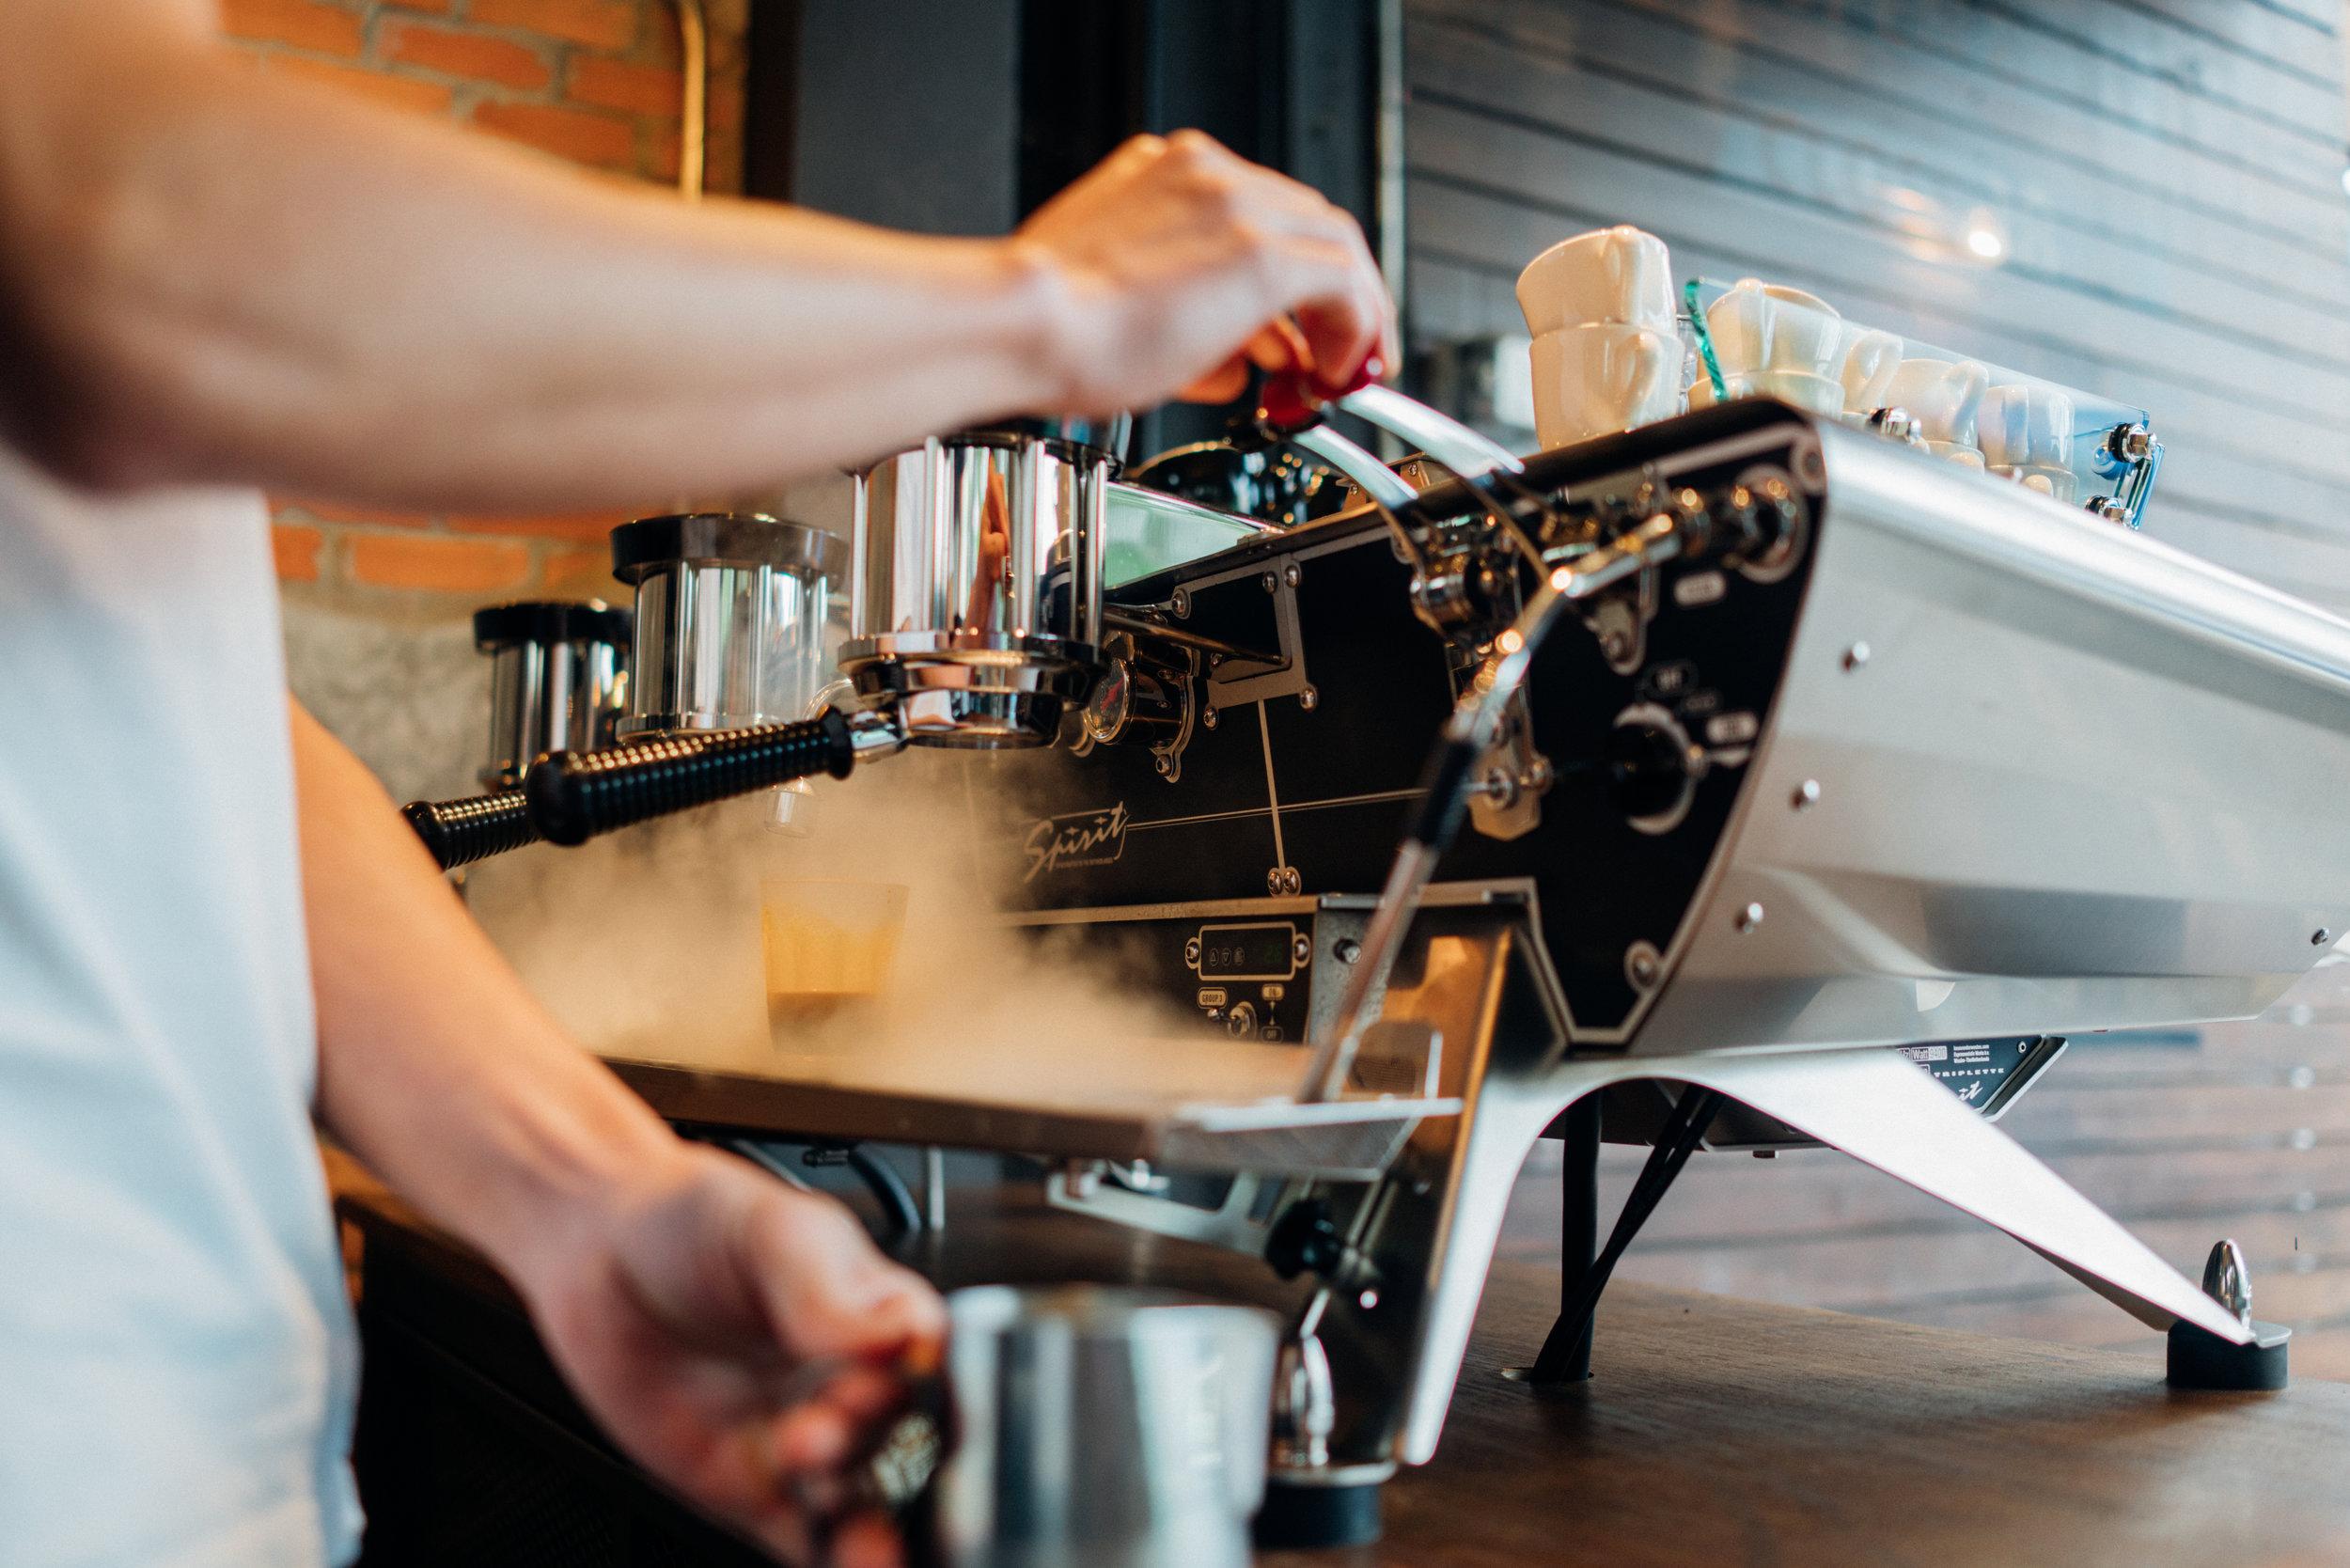 Akha Ama Coffee La Fattoria's just-arrived Spirit Triplette three-group espresso machine